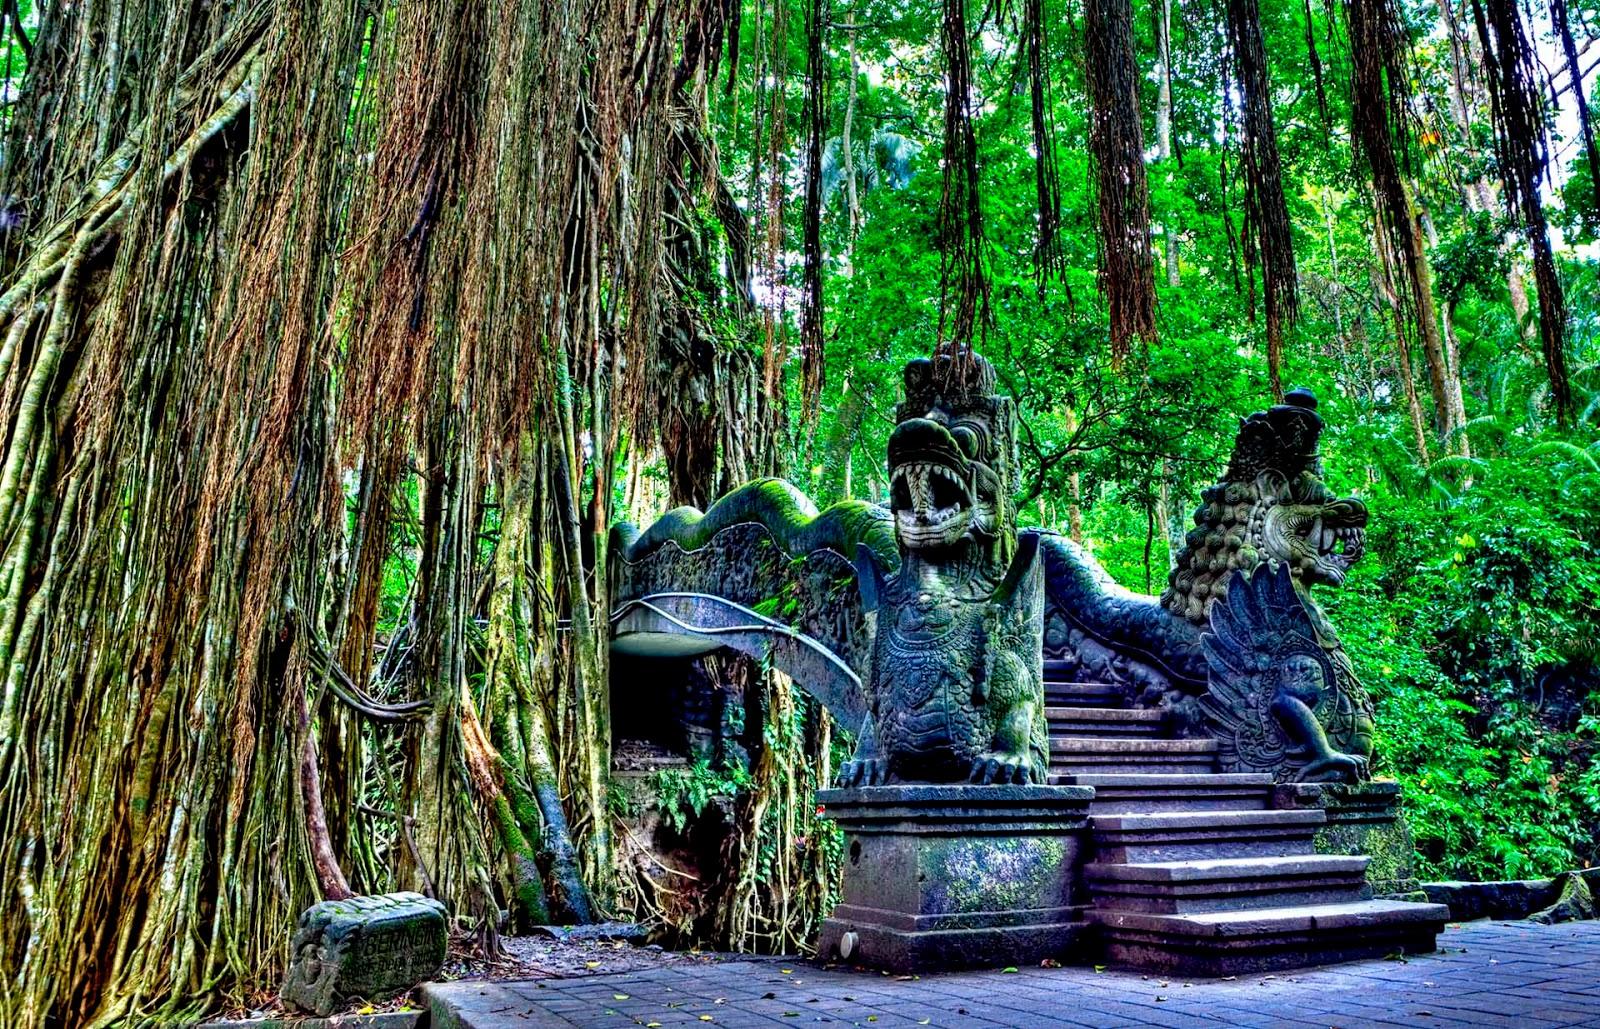 Tempat wisata-Bali Monkey Forest.